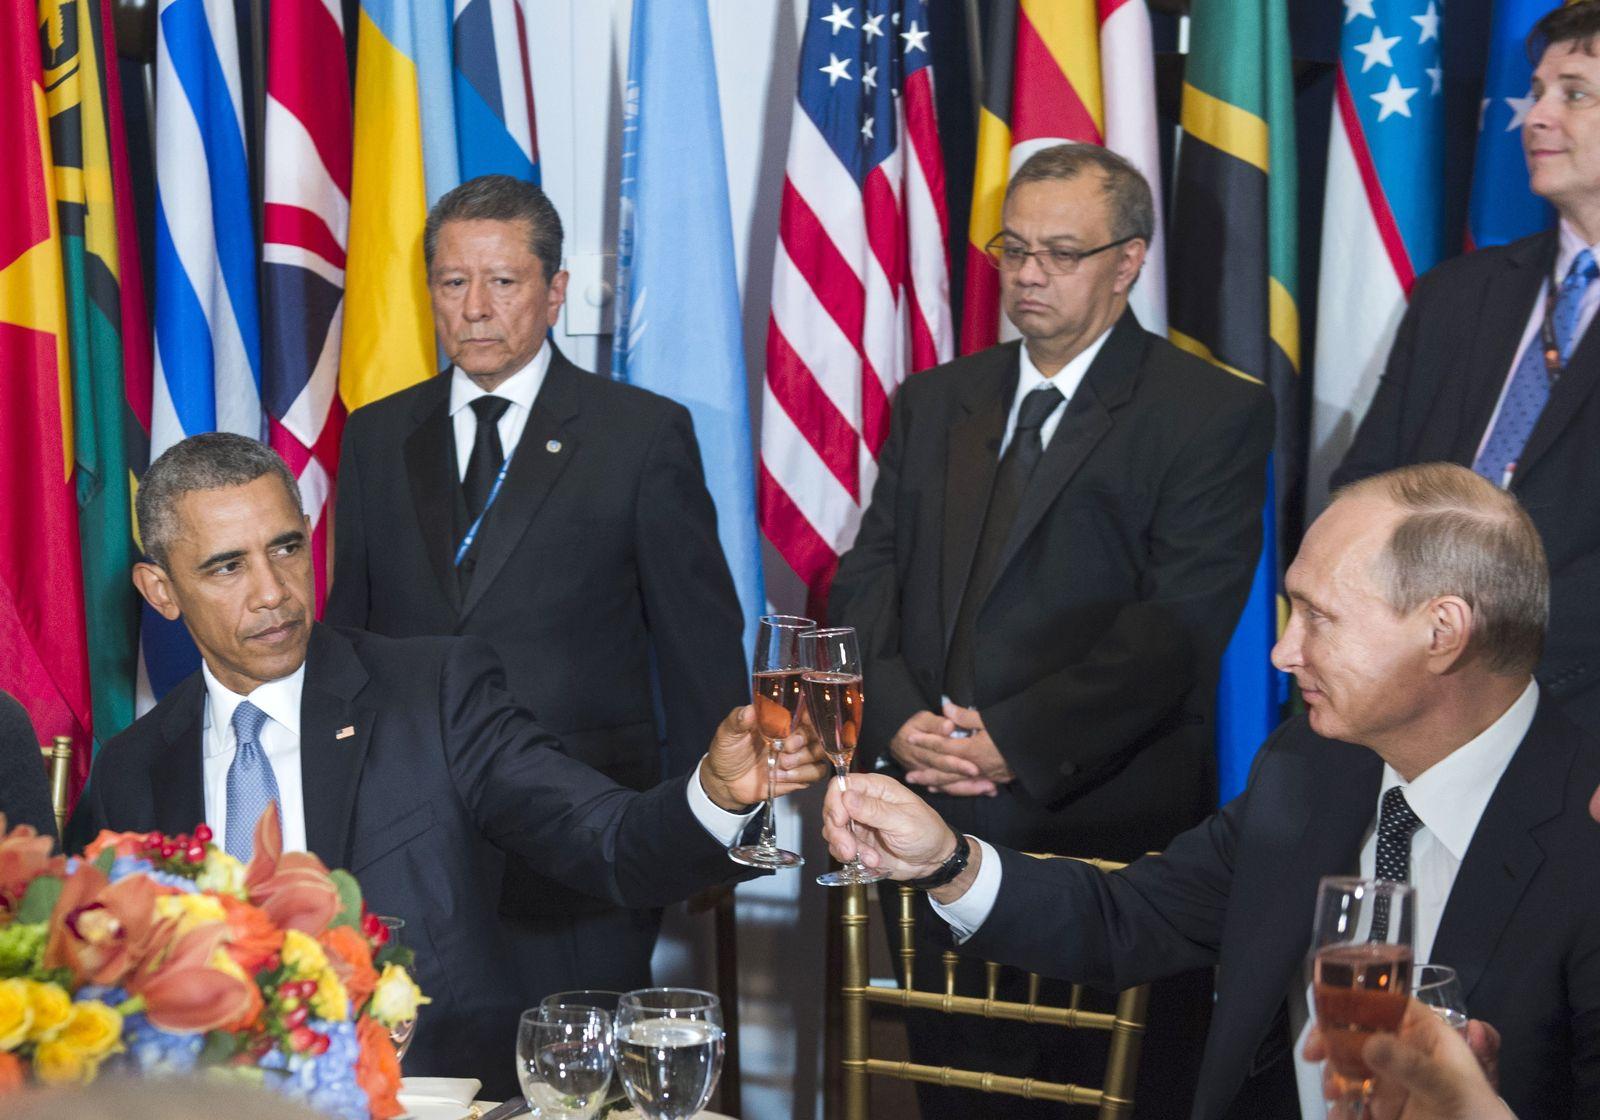 Barack Obama / Wladimir Putin / Uno